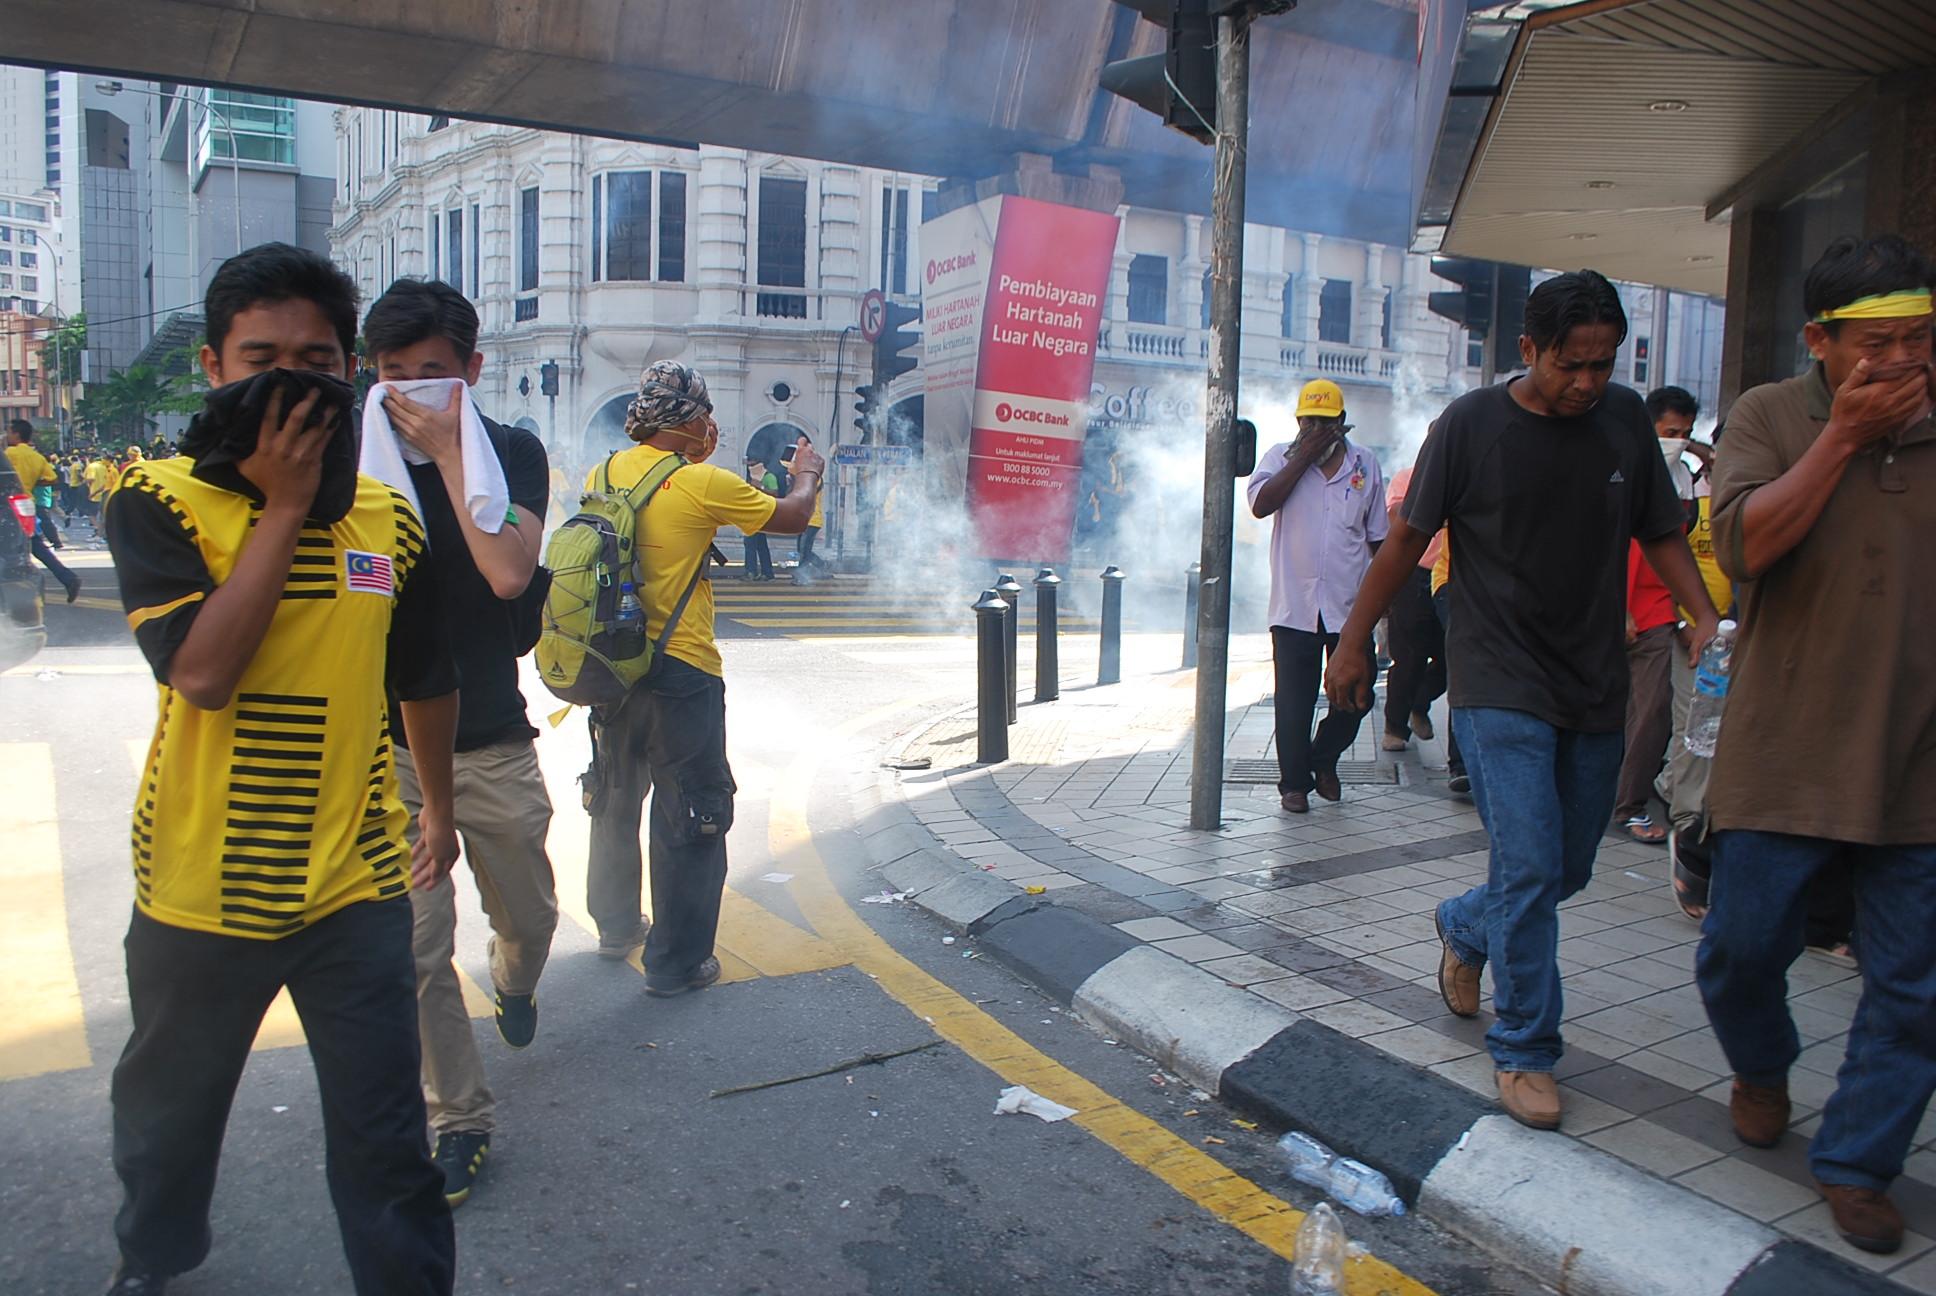 Protestors flee teargas in Kuala Lumpur on April 28 (Photo: Simon Roughneen)